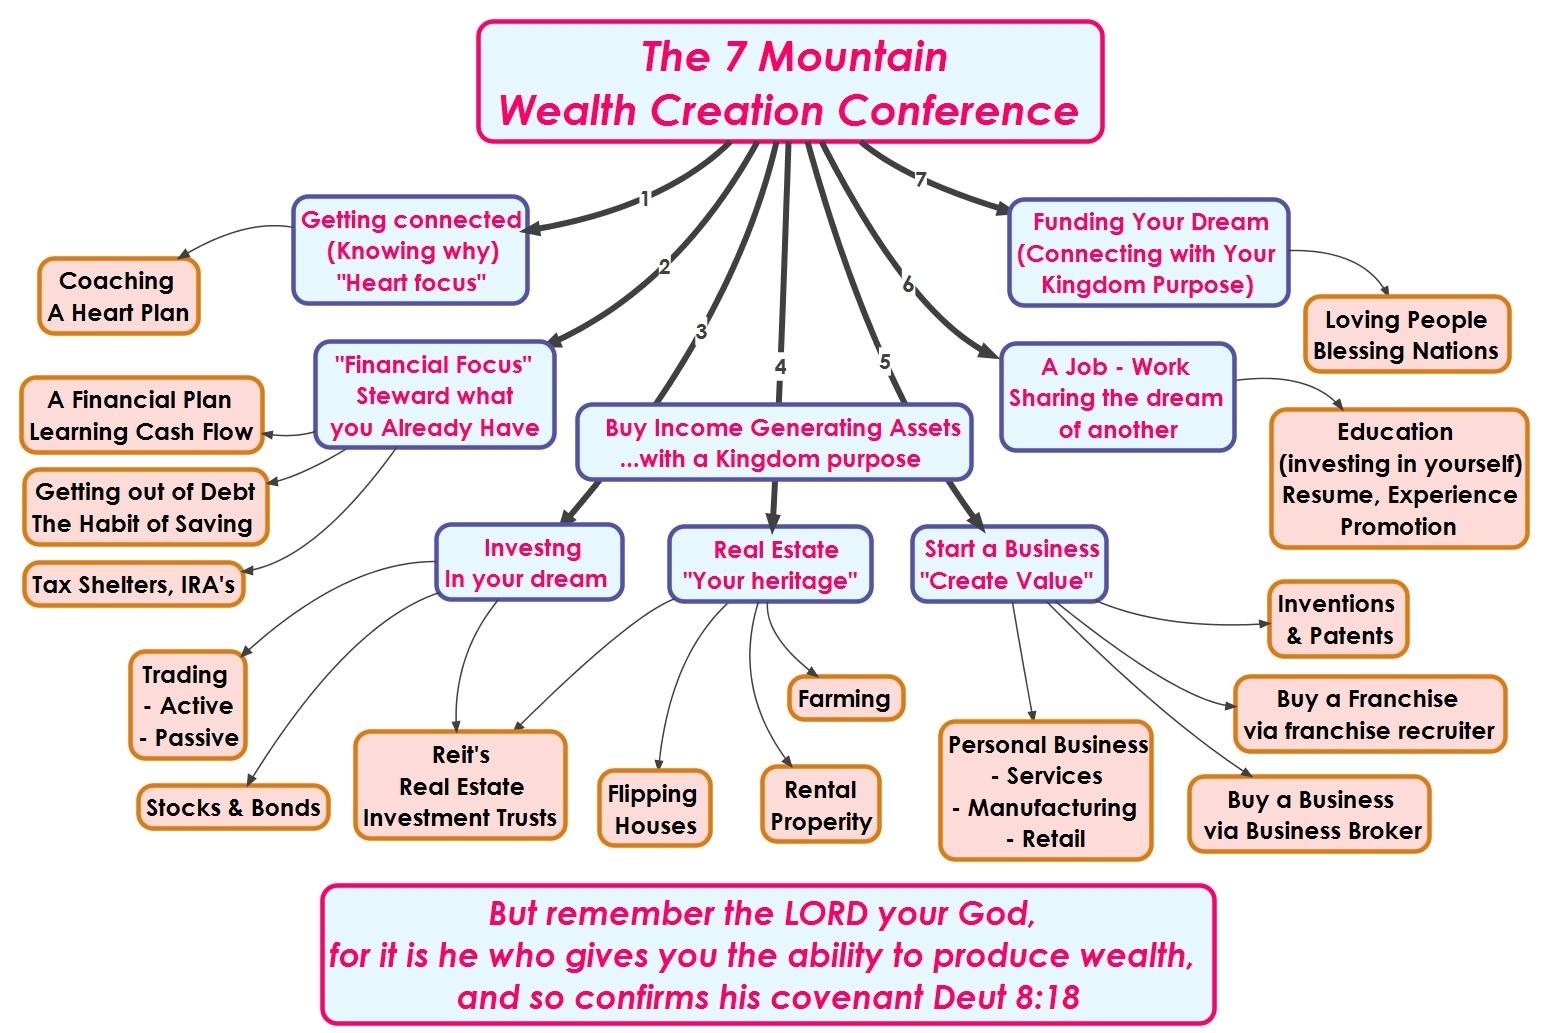 2014-06-28 Wealth Creation